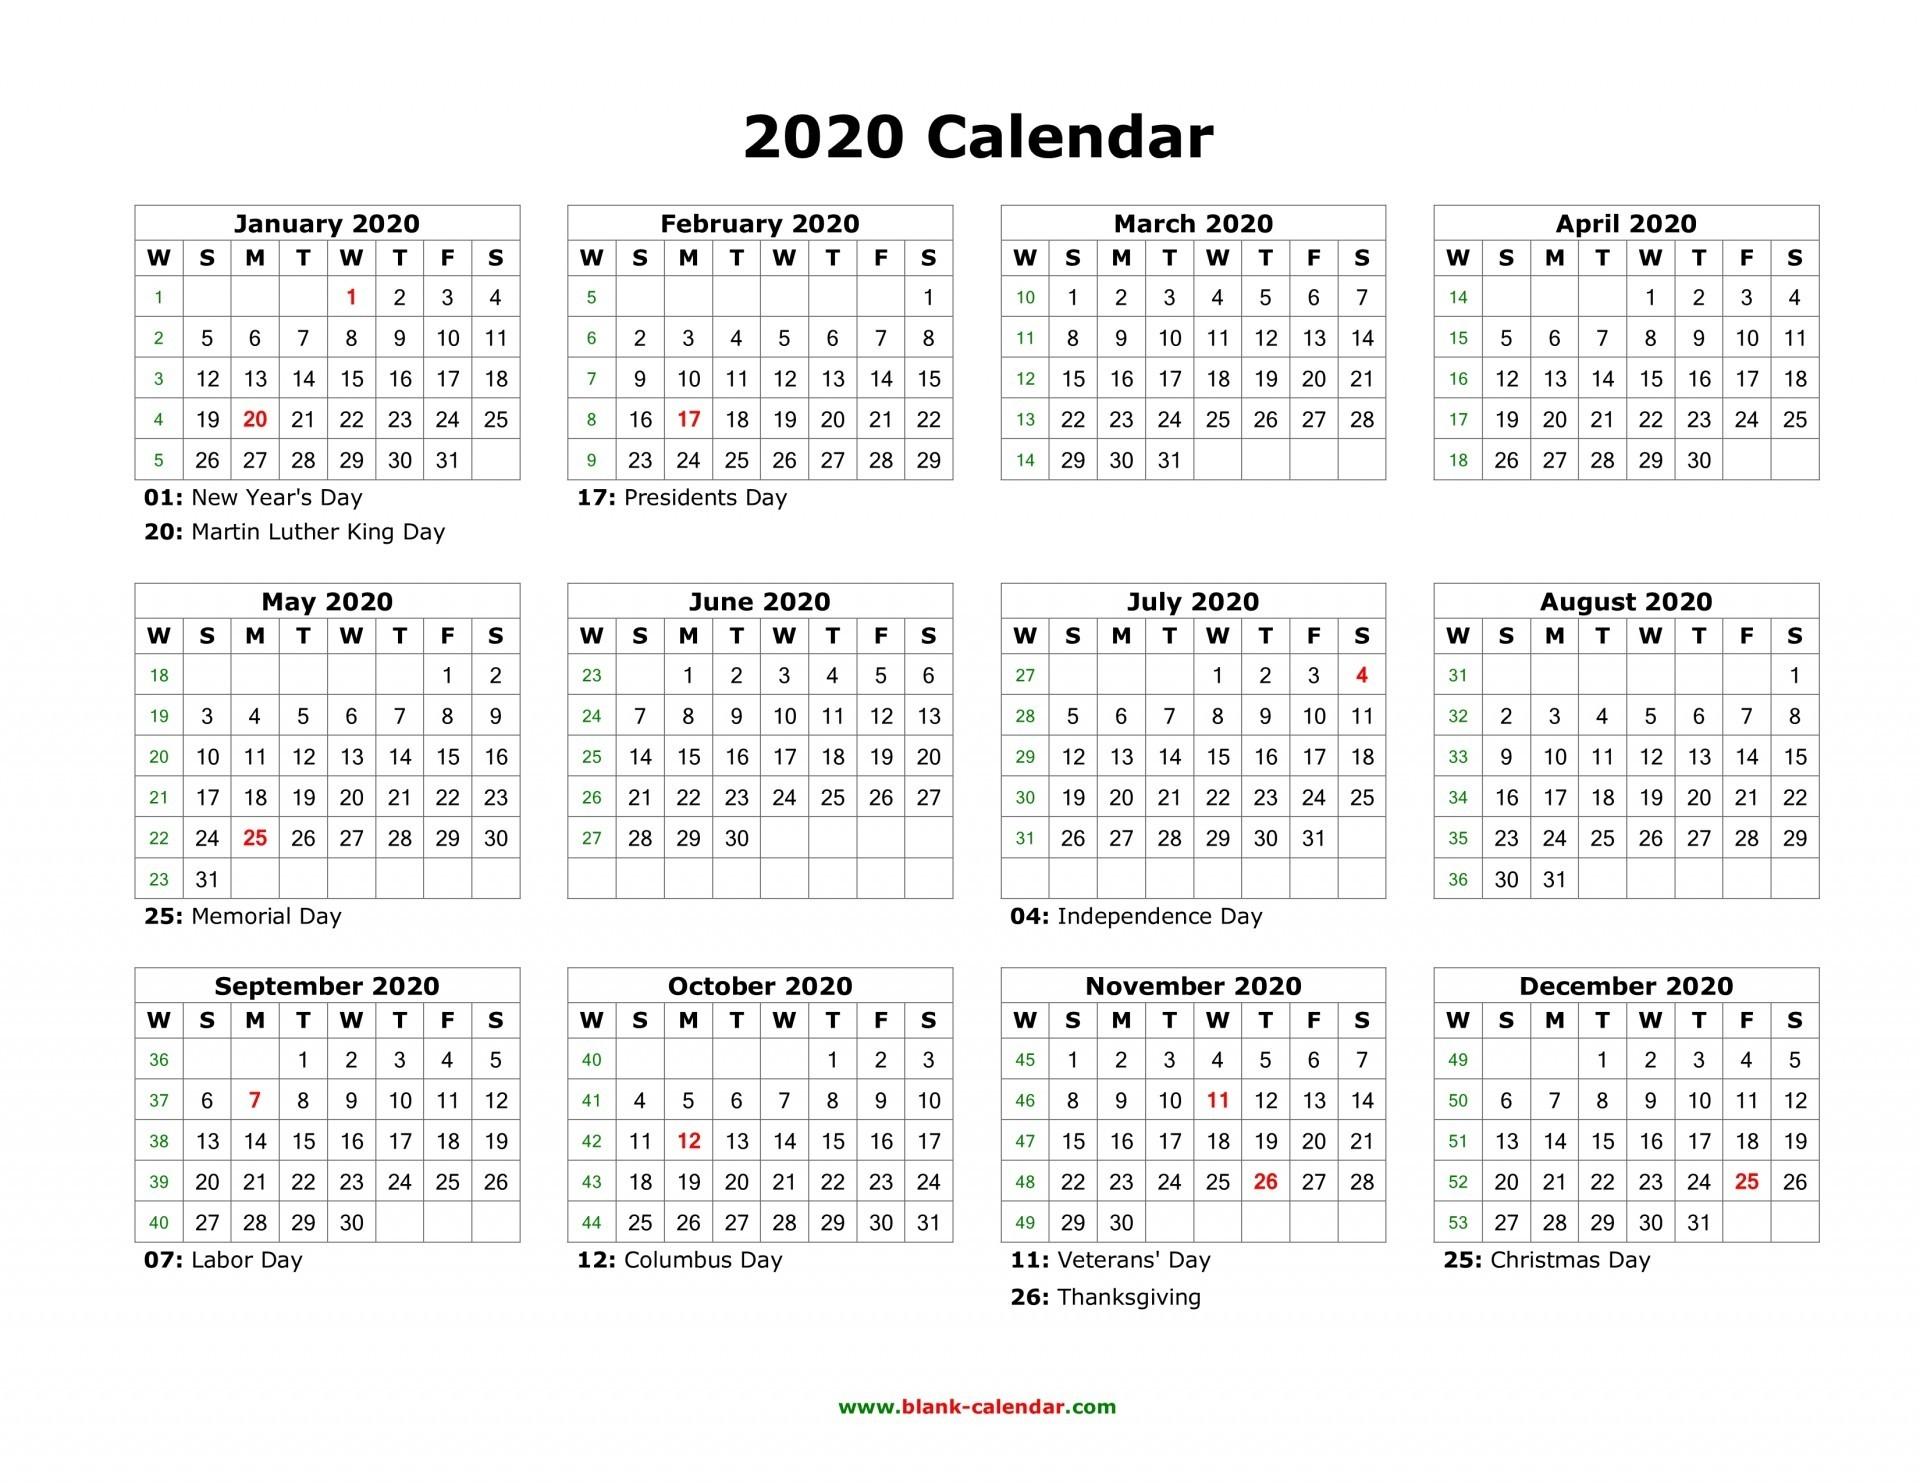 Free Printable 2020 Calendar With Holidays South Africa-January 2020 Calendar With Holidays South Africa